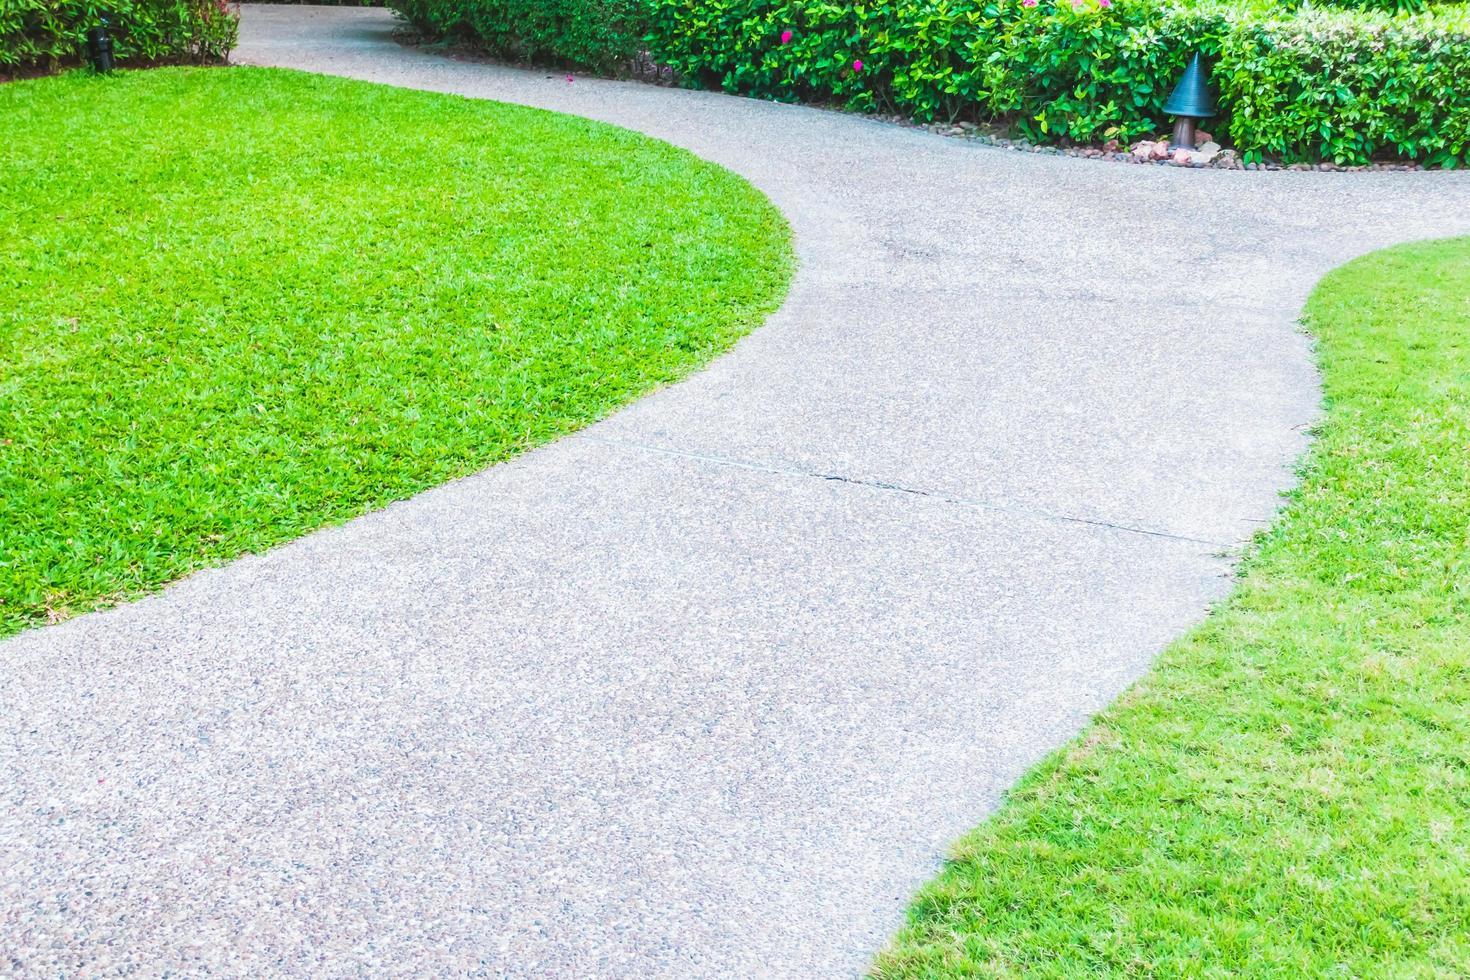 stenen pad weg in de tuin foto